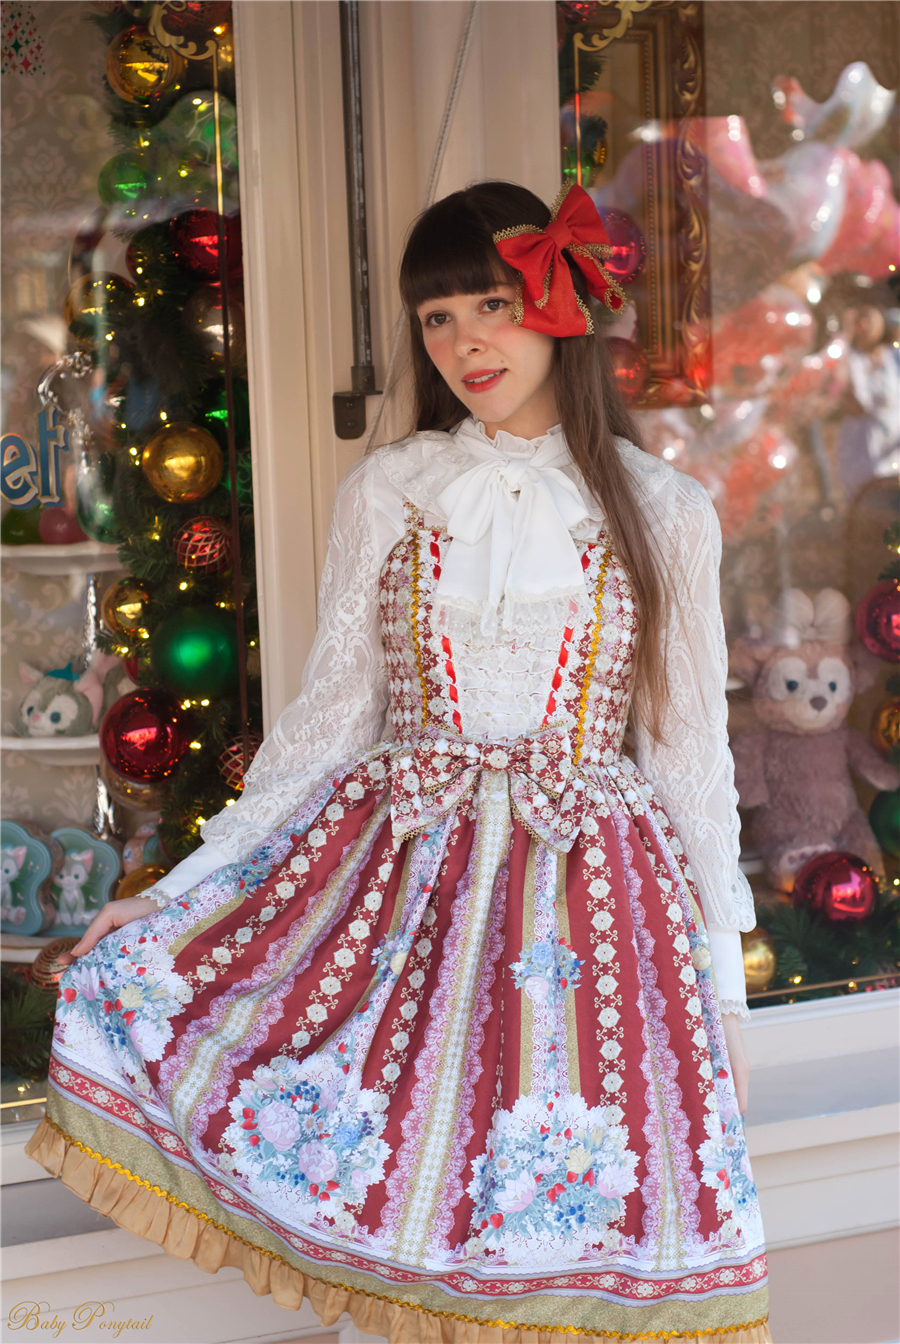 Baby Ponytail_Model Photo_Polly's Garden of Dreams_JSK Red_Claudia_11.jpg